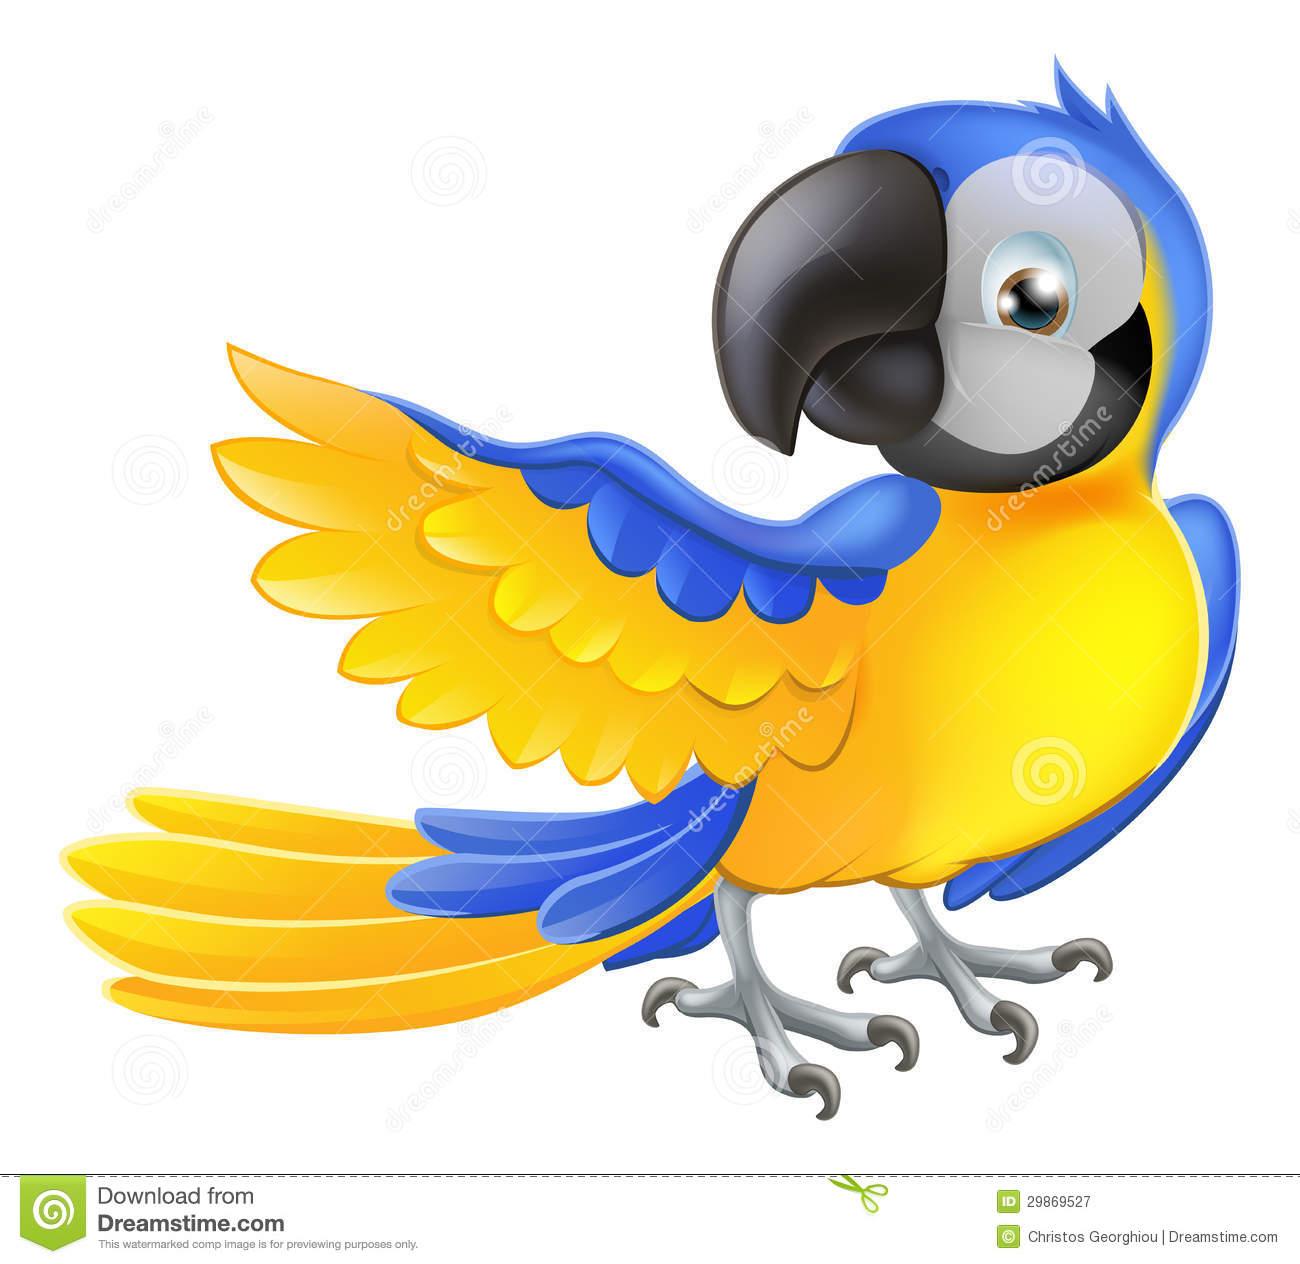 Blue parrot clipart clip art black and white download Cute Parrot Clipart   Free download best Cute Parrot Clipart on ... clip art black and white download